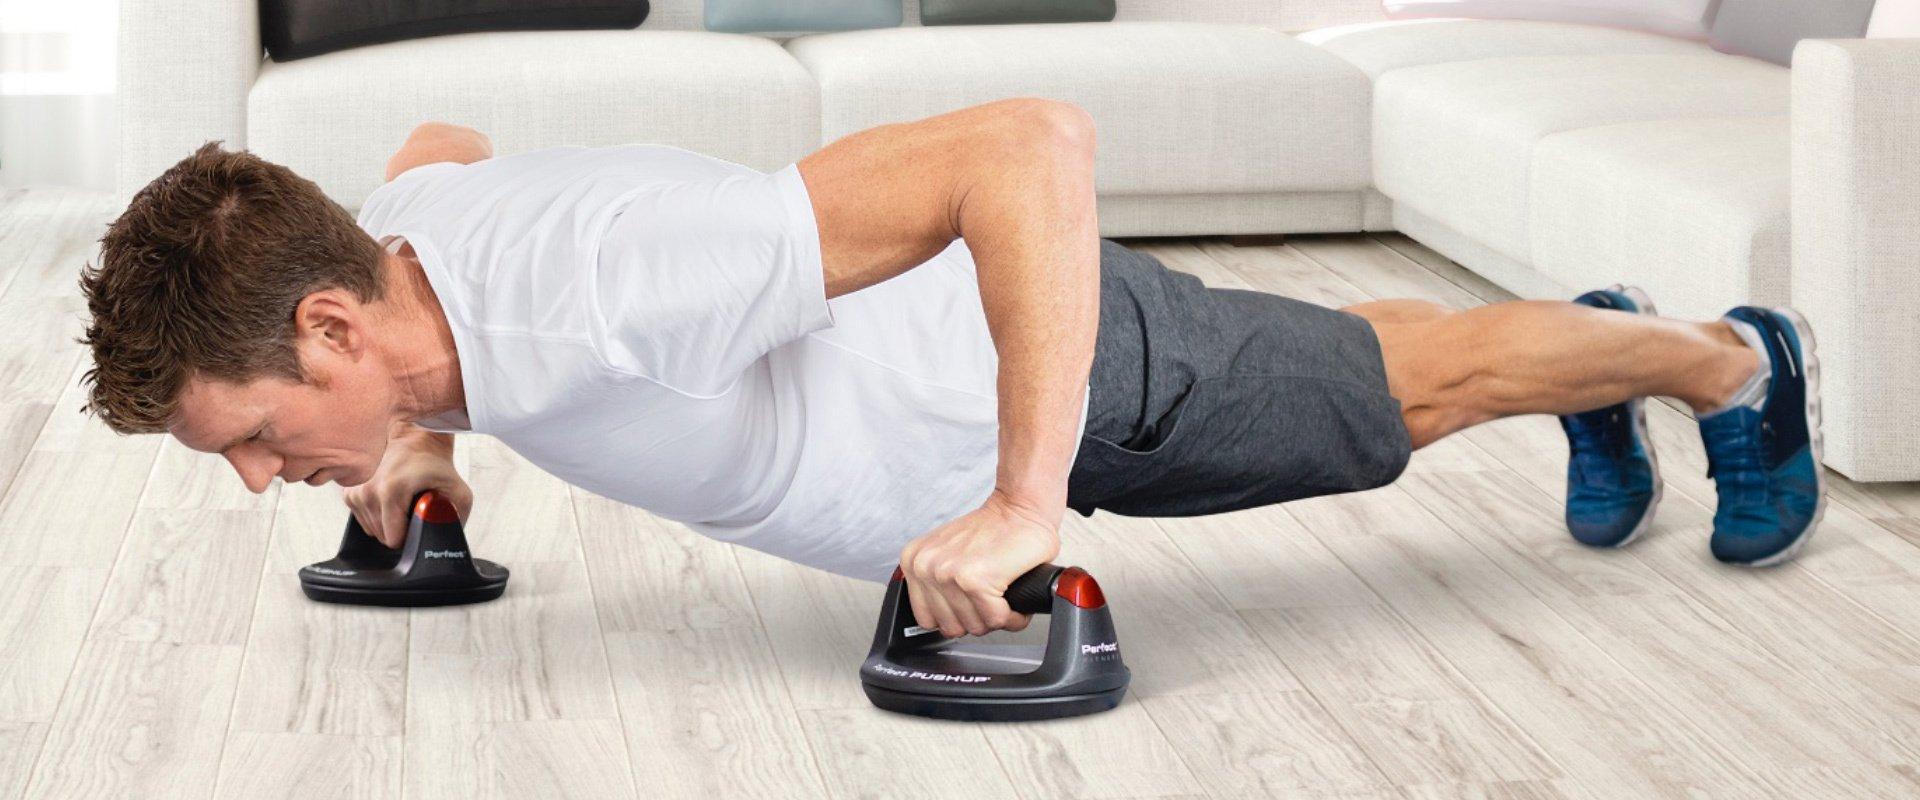 Программа тренировок с поворотными упорами для отжиманий